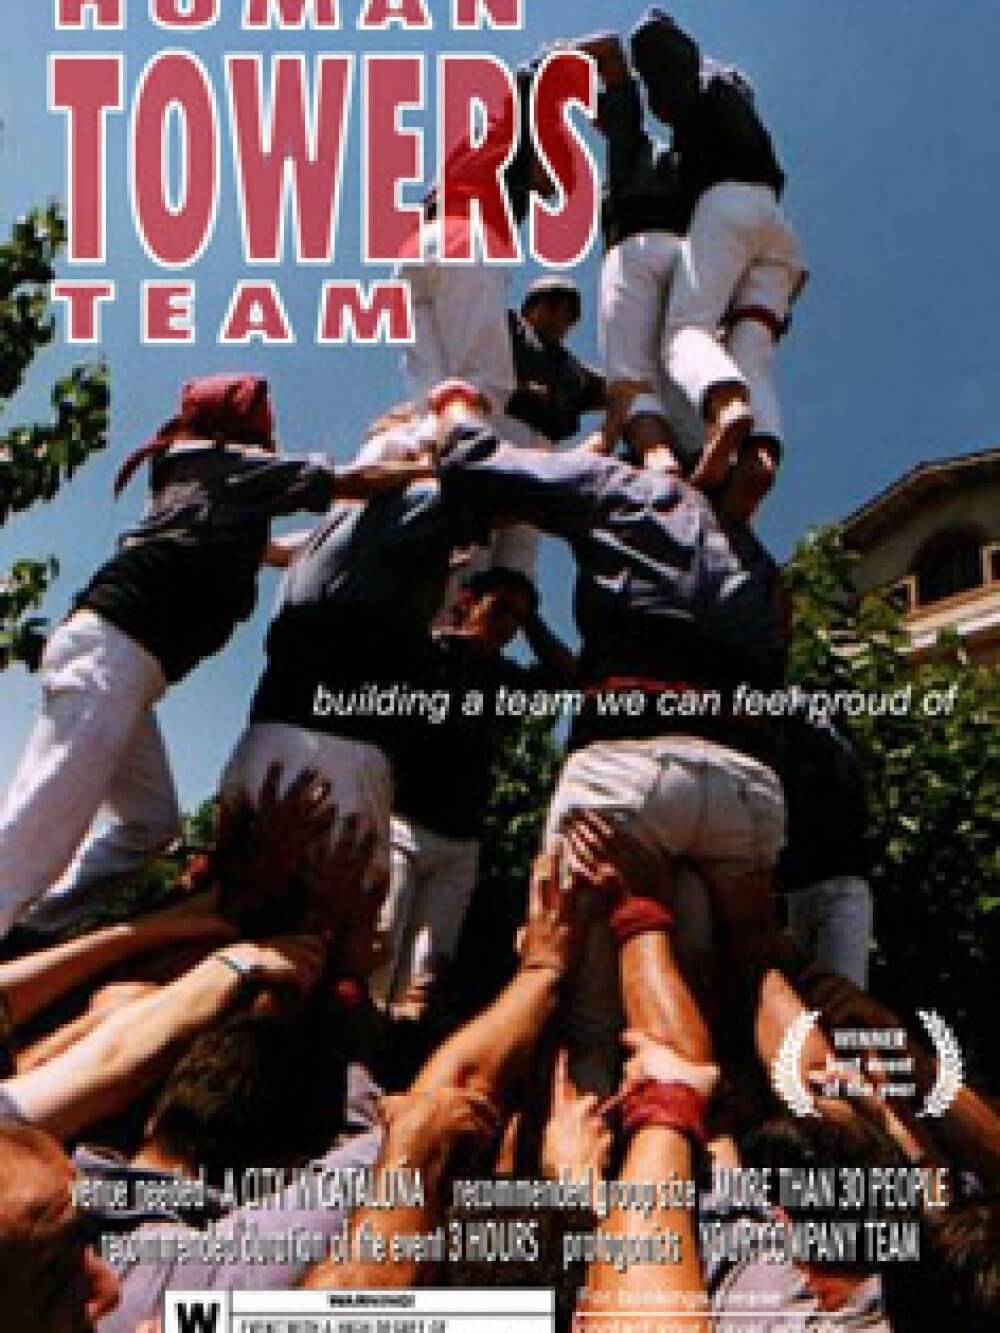 human_towers_team_vertical_web